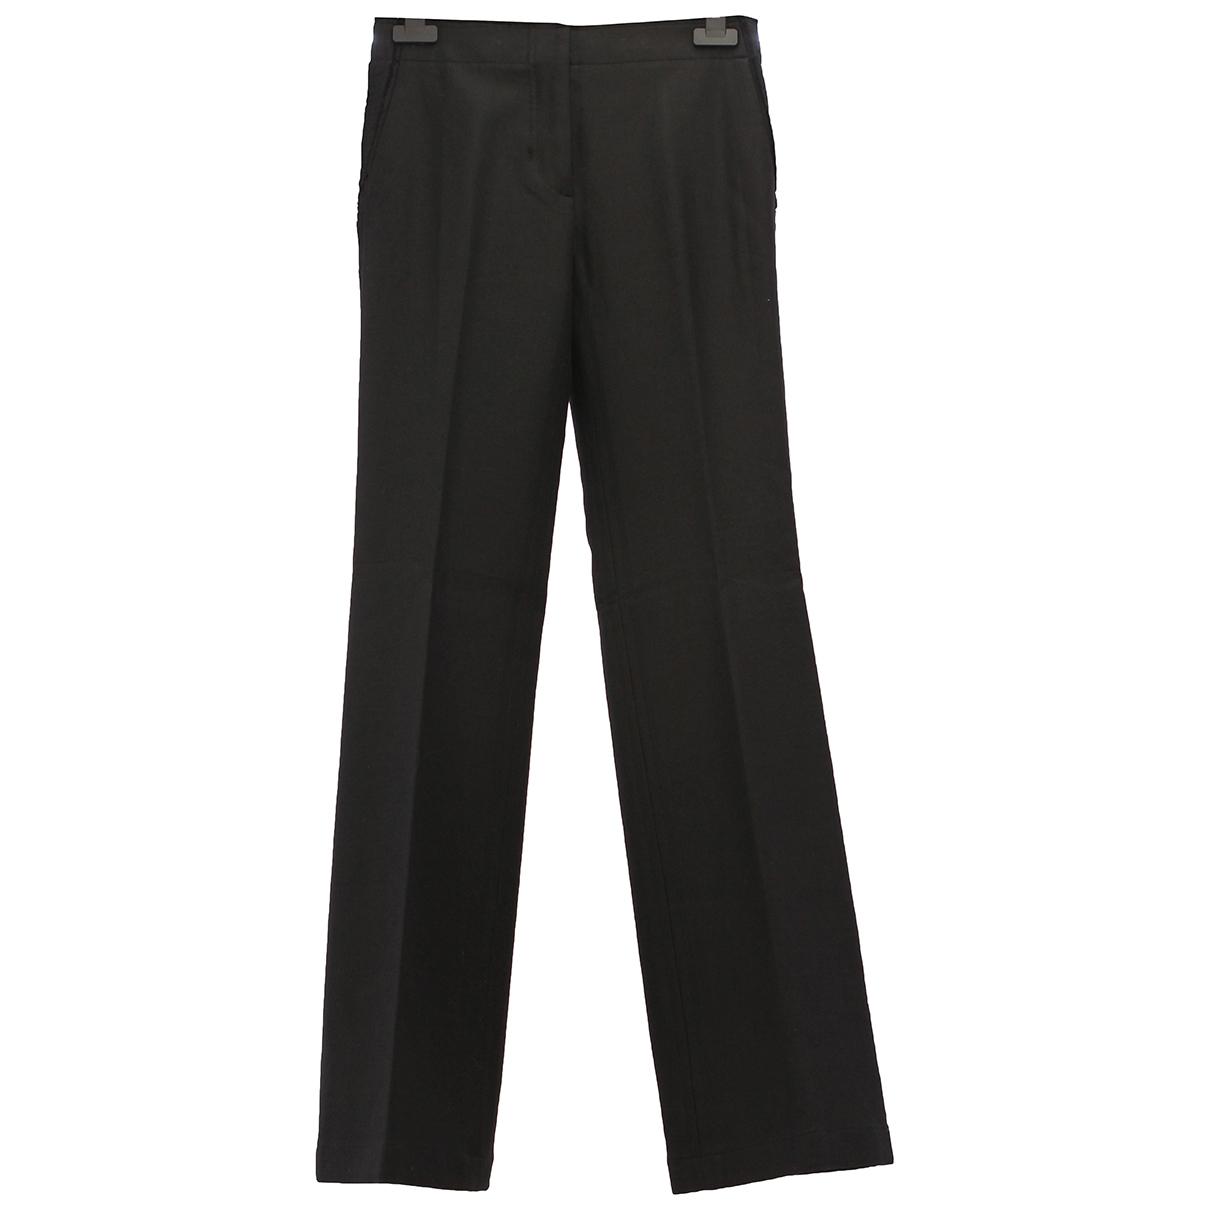 Helmut Lang \N Black Cotton Trousers for Women 0 0-5